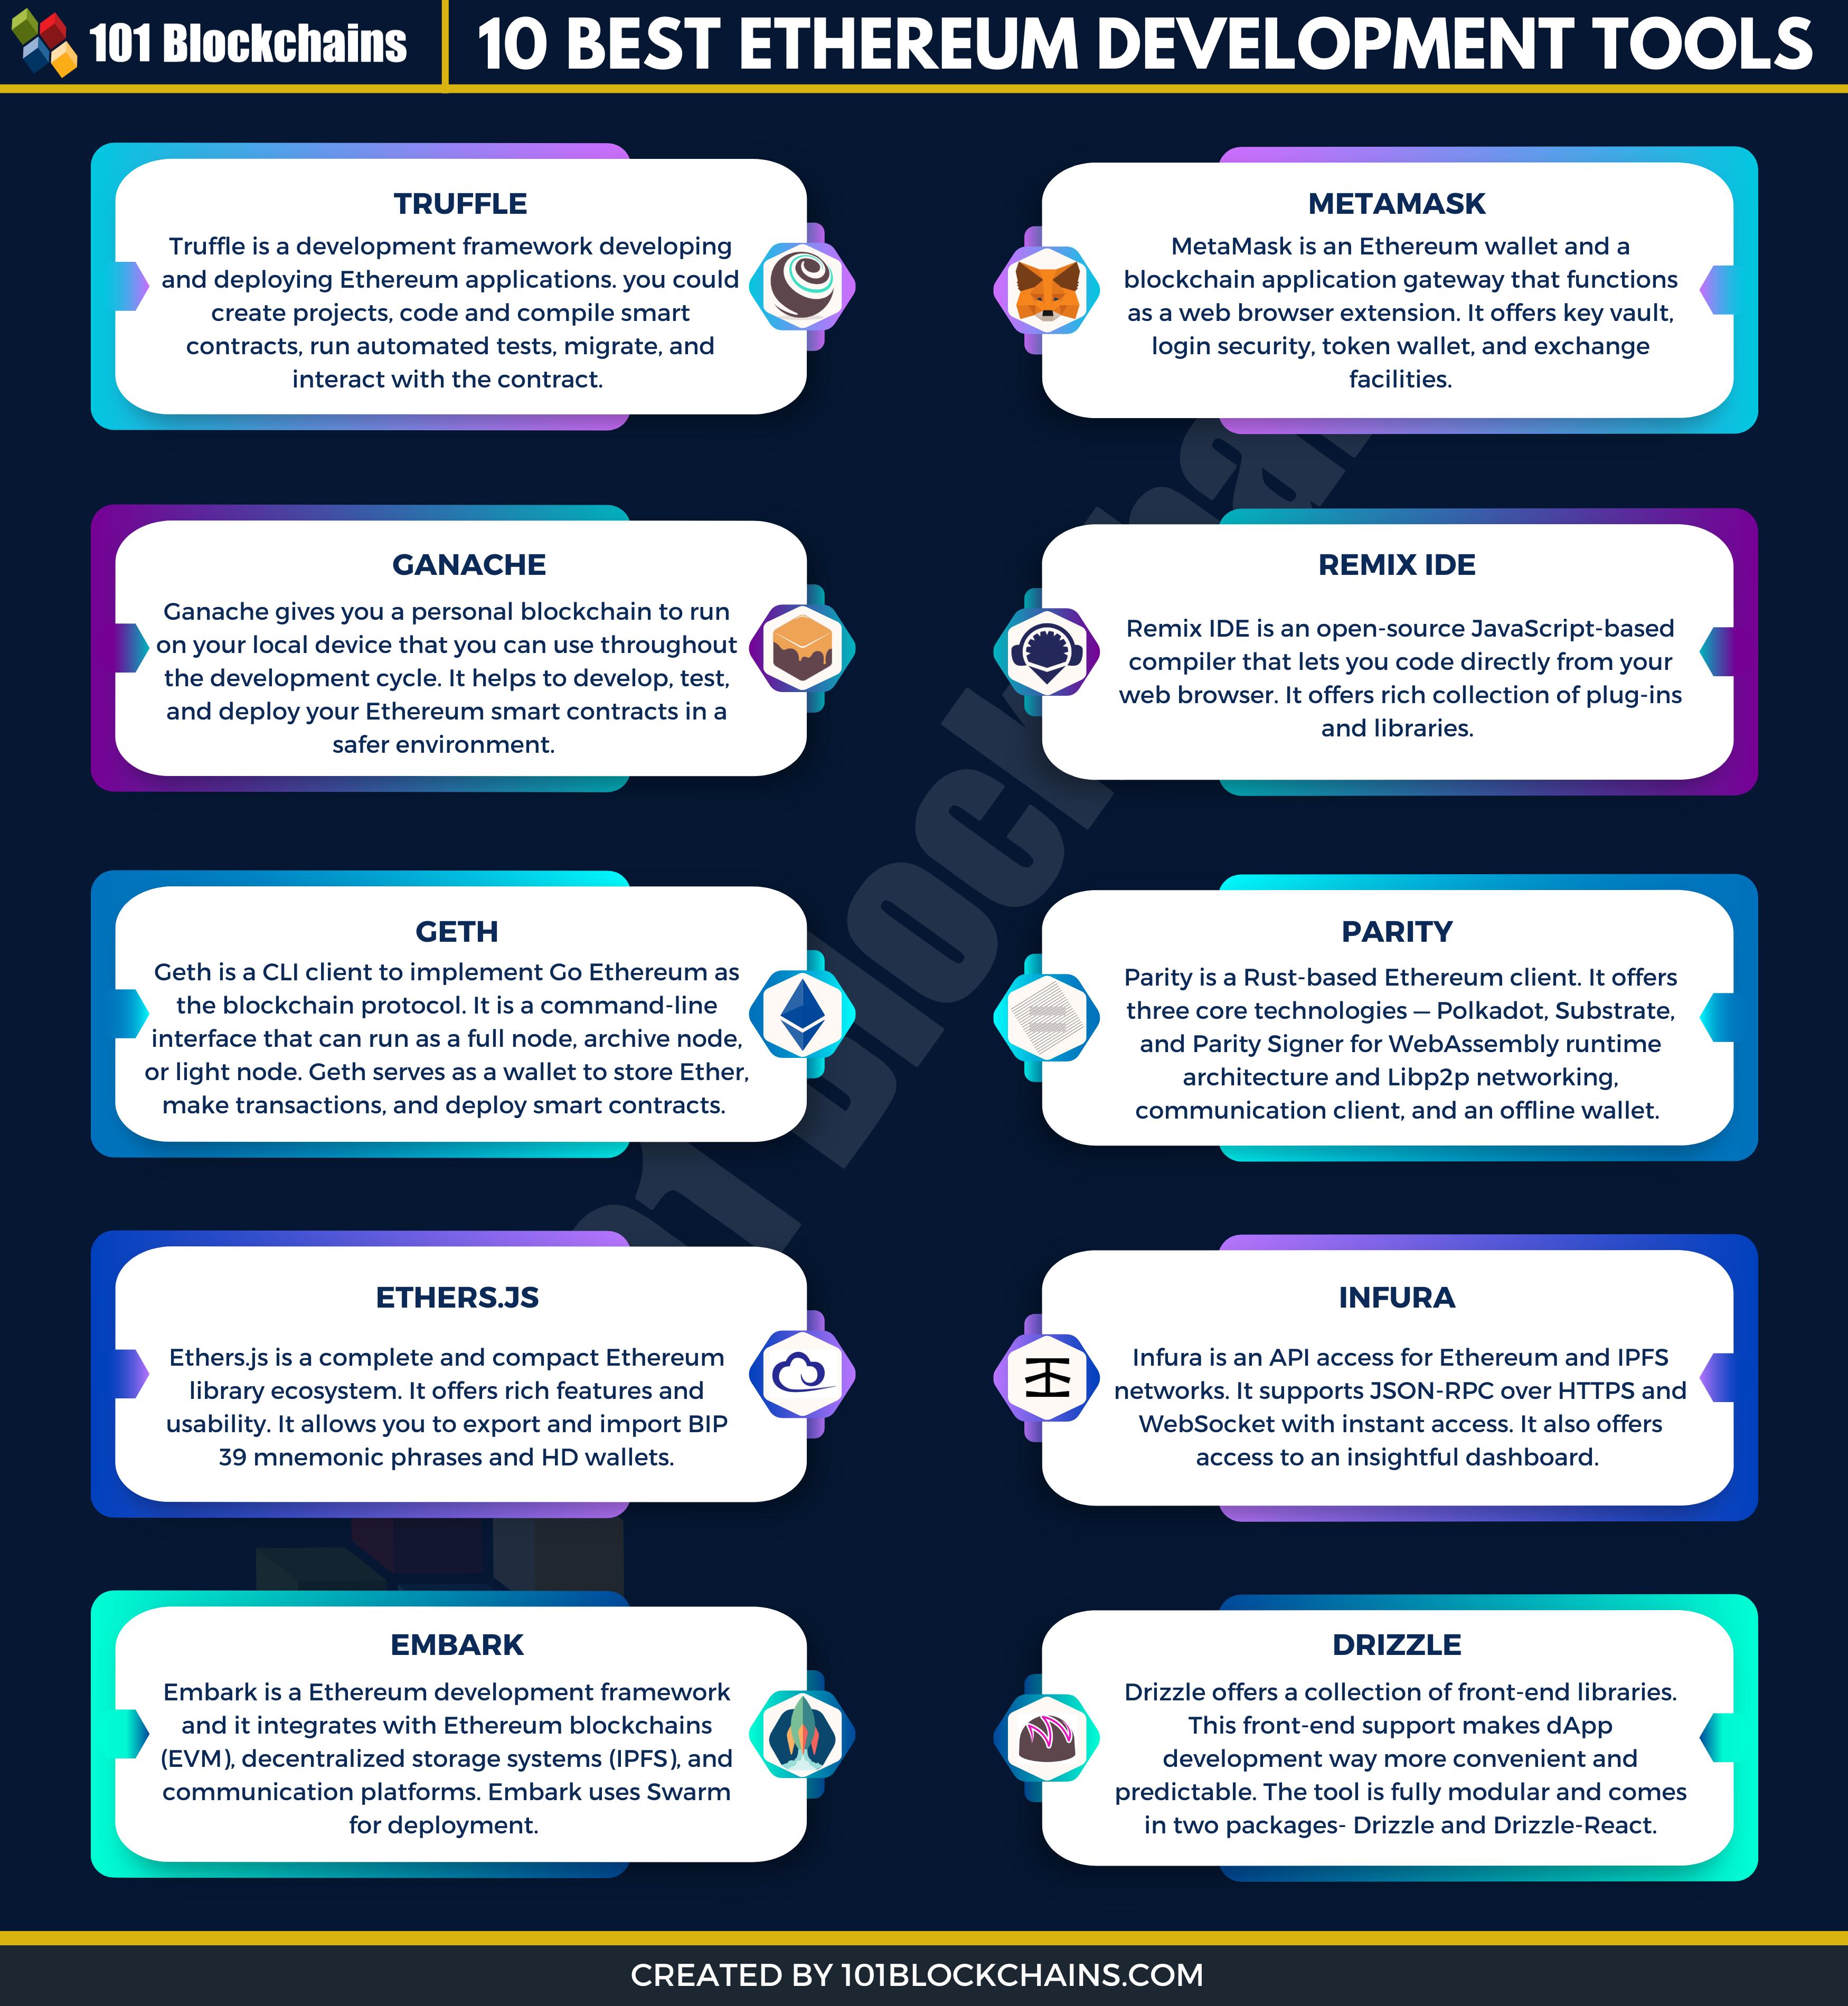 10 best ethereum development tools